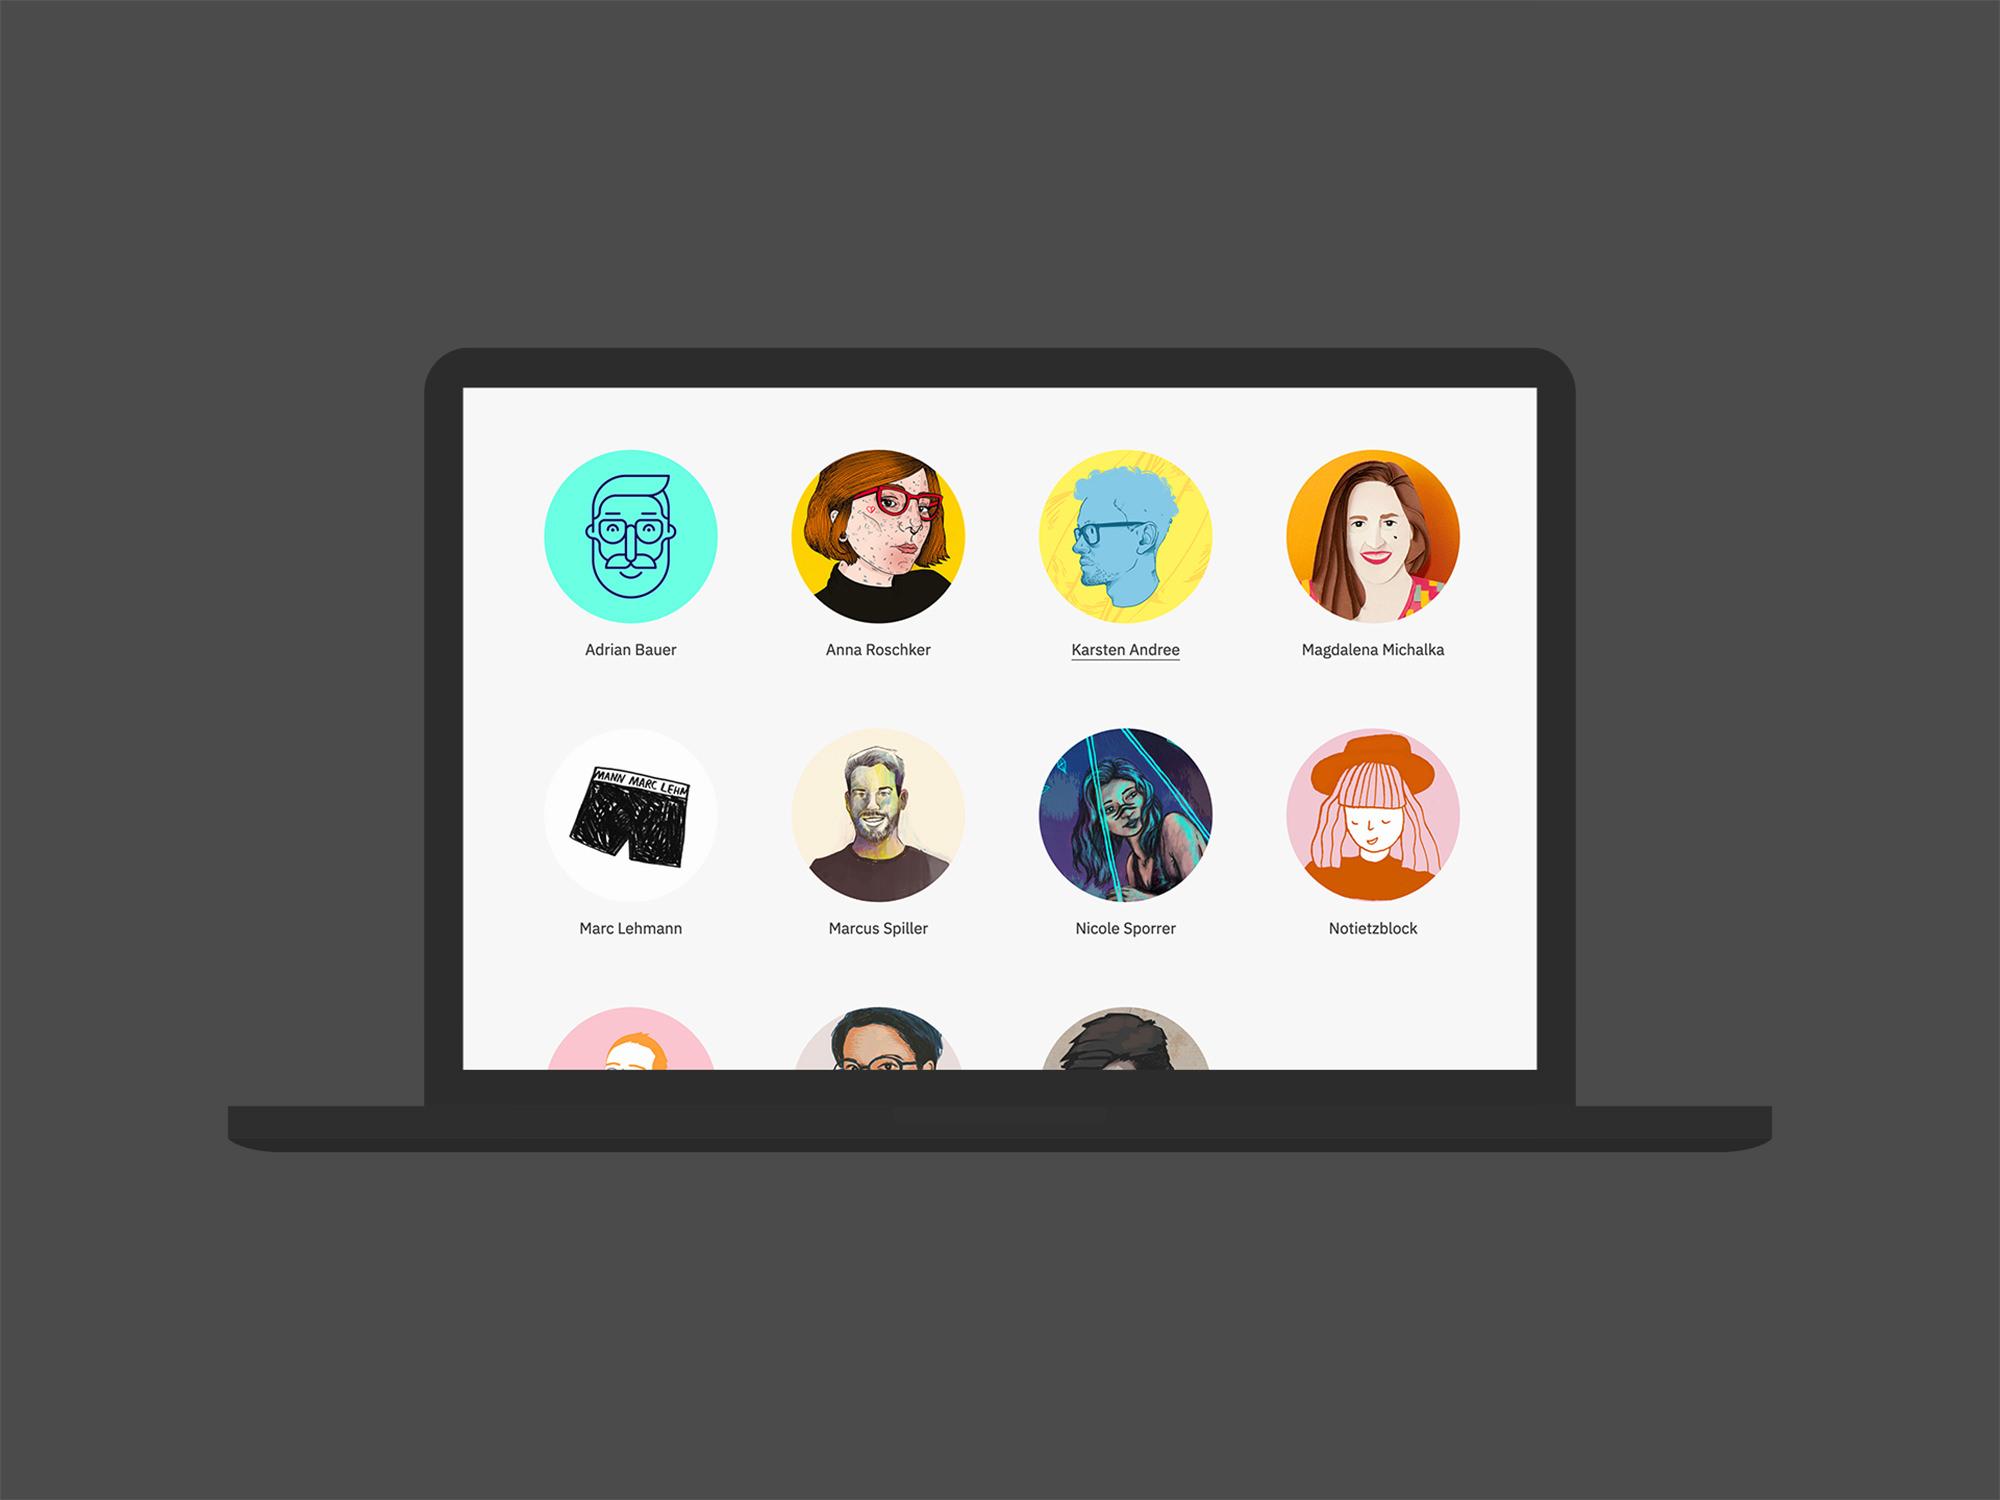 Web 02 (Rauchwetter, Corporate Design)